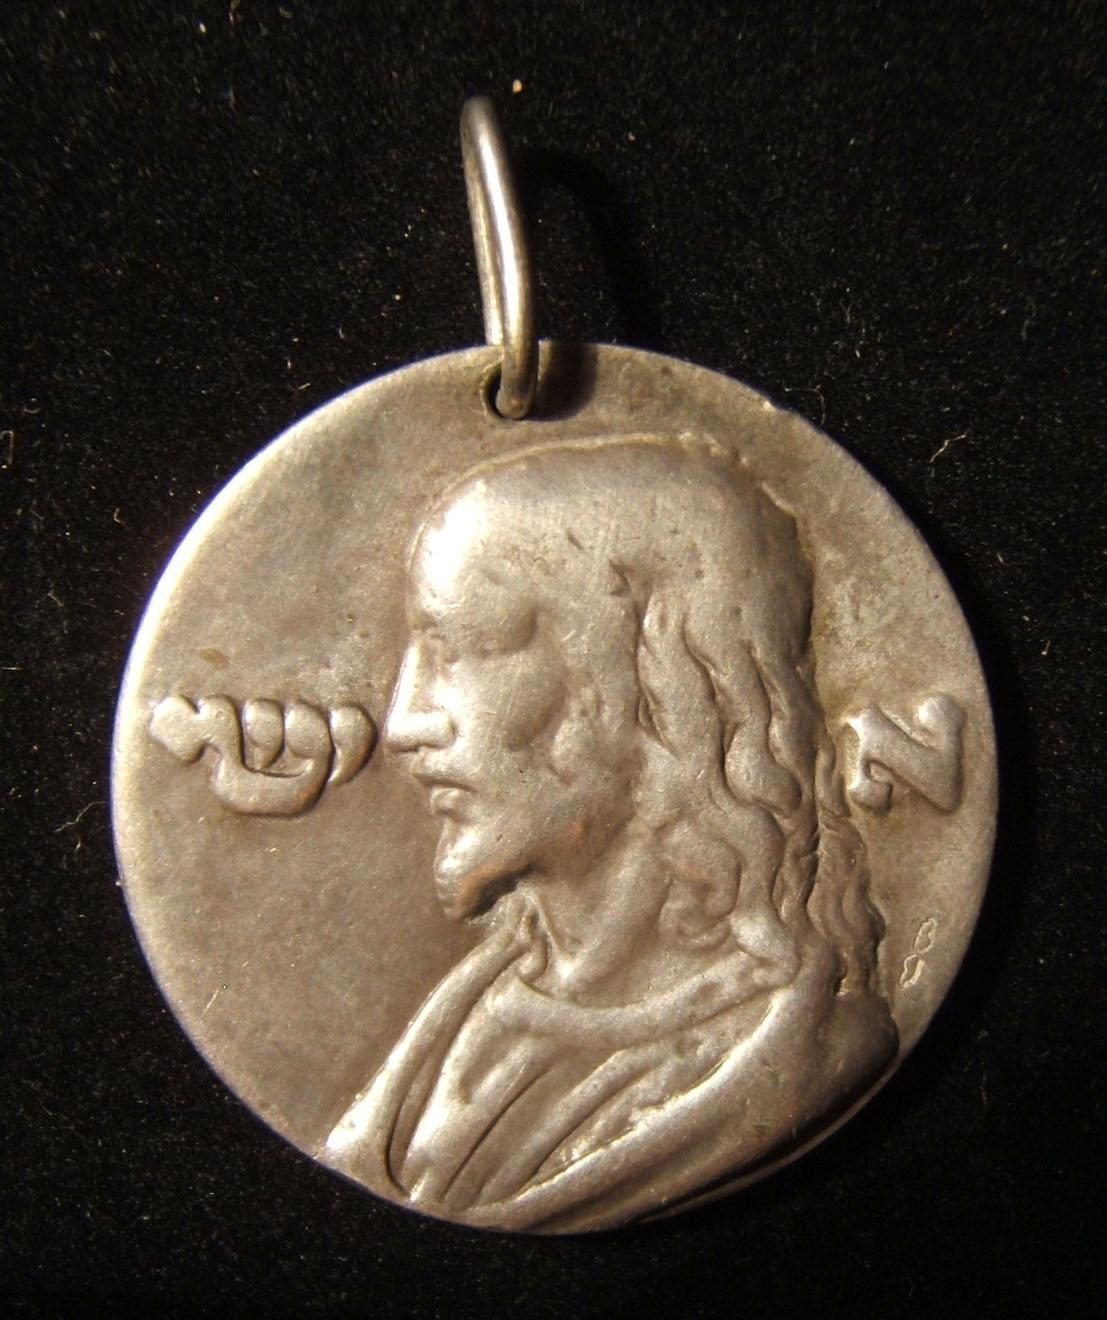 Lot 73 - Medals: Biblical/Religious  -  Historama HISTORAMA AUCTION #7 - 'Buy or Bid' Sale